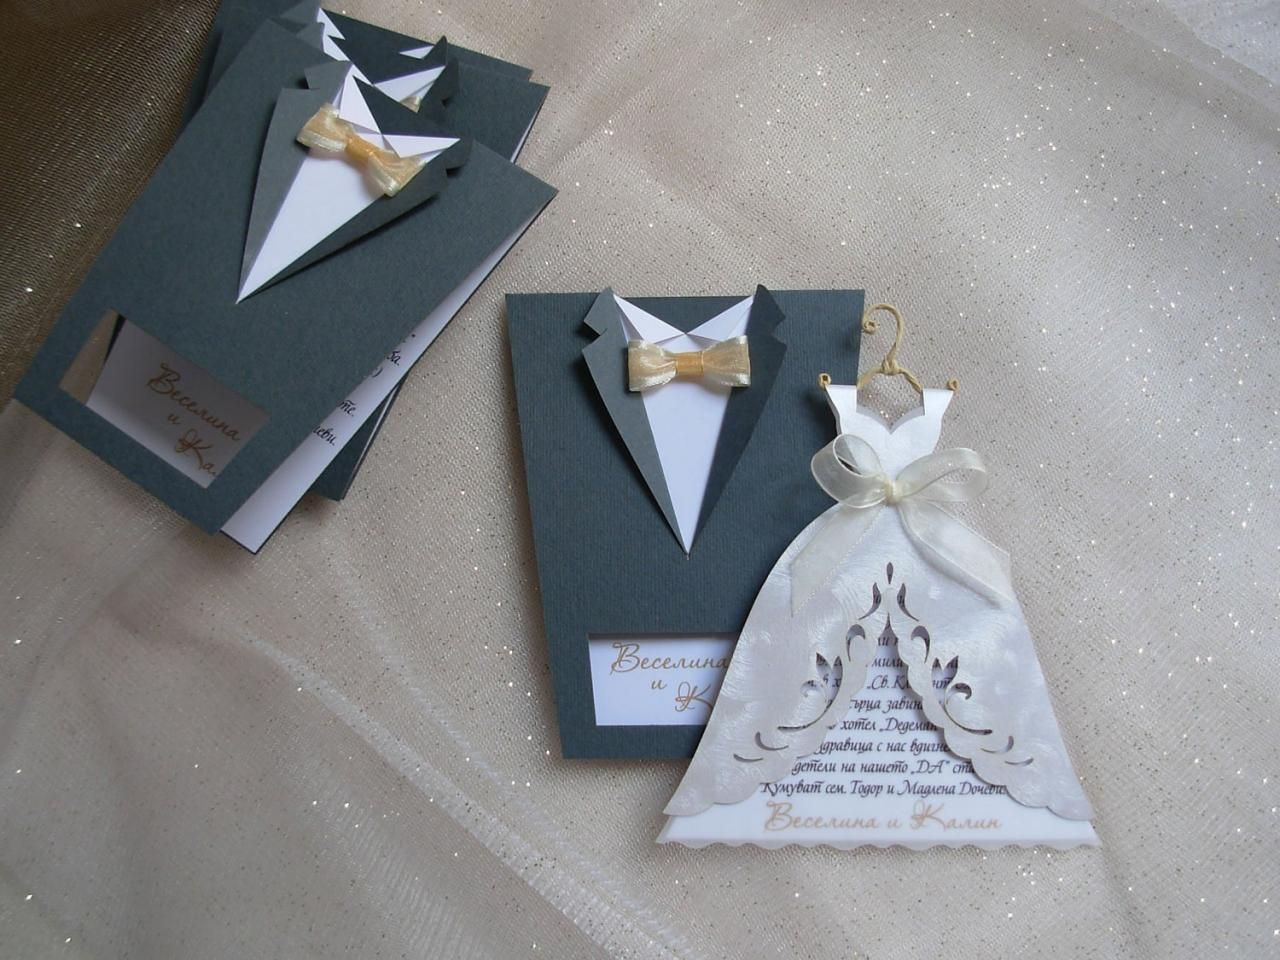 Bridal Wedding Invitations Bride And